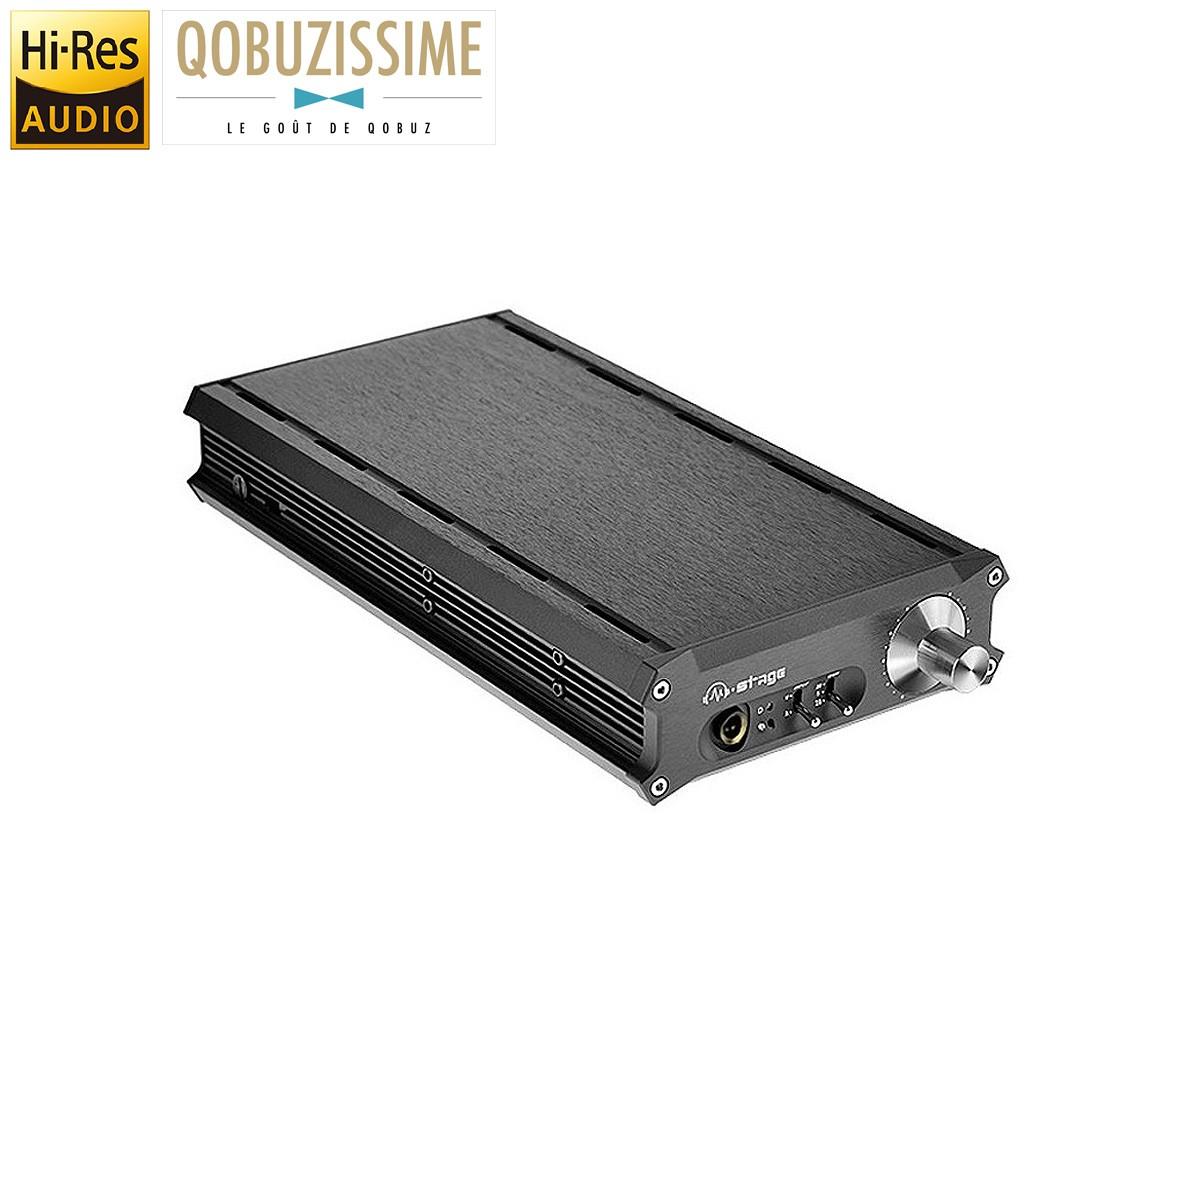 MATRIX M-STAGE HPA-3U+ USB DAC Headphone Amplifier Class A 24bit 192kHz DSD128